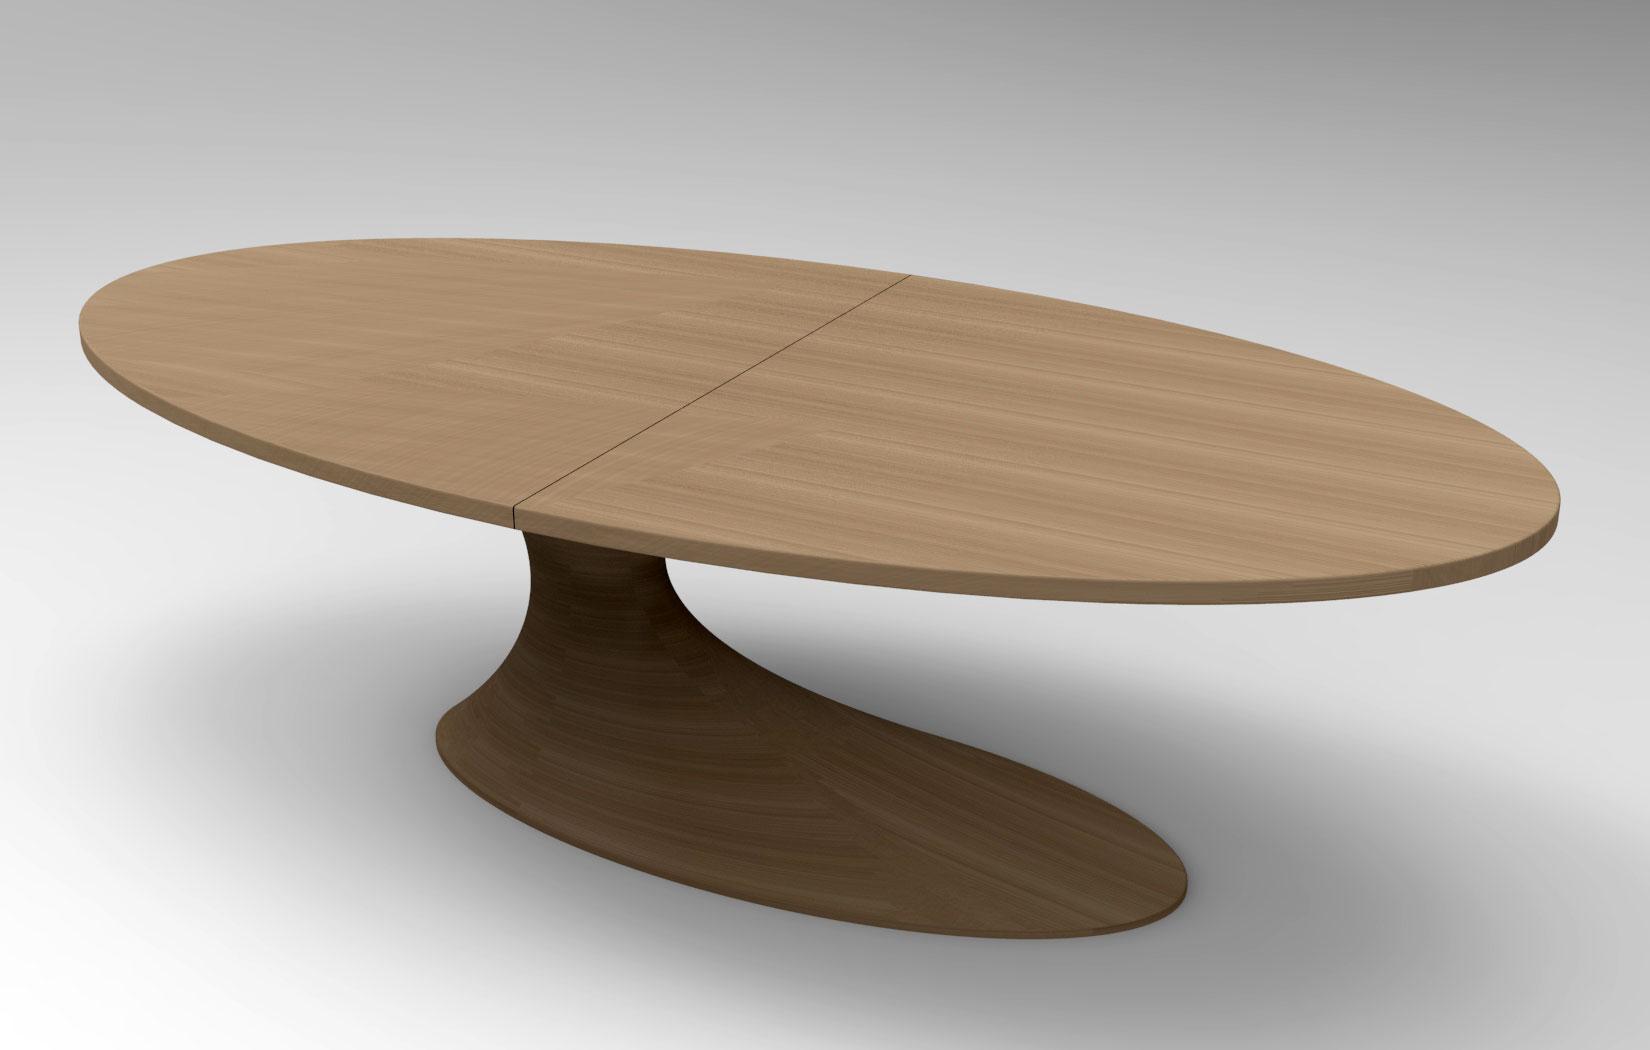 En bois massif table de conf rence ovale table en bois id for Table ovale en bois massif